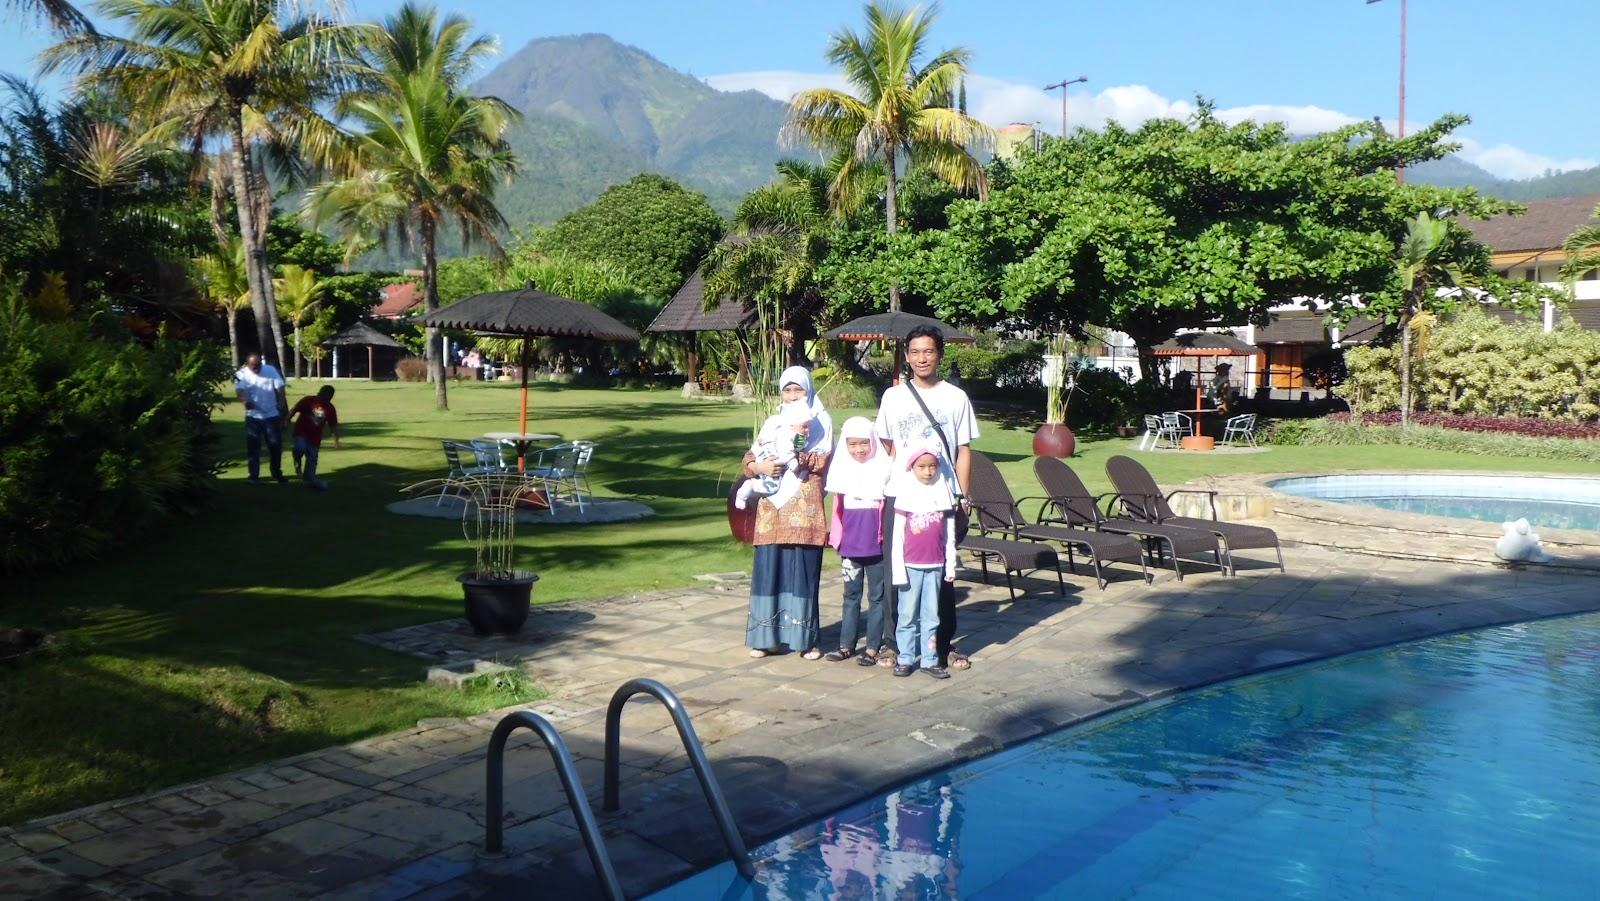 Sebenarnya Pemandangan Di Hotel Cukup Bagus Dengan Latar Belakang Gunung Arjuno Hari Ketiga Ini Anak Bermain Outbond Mini Yang Disediakan